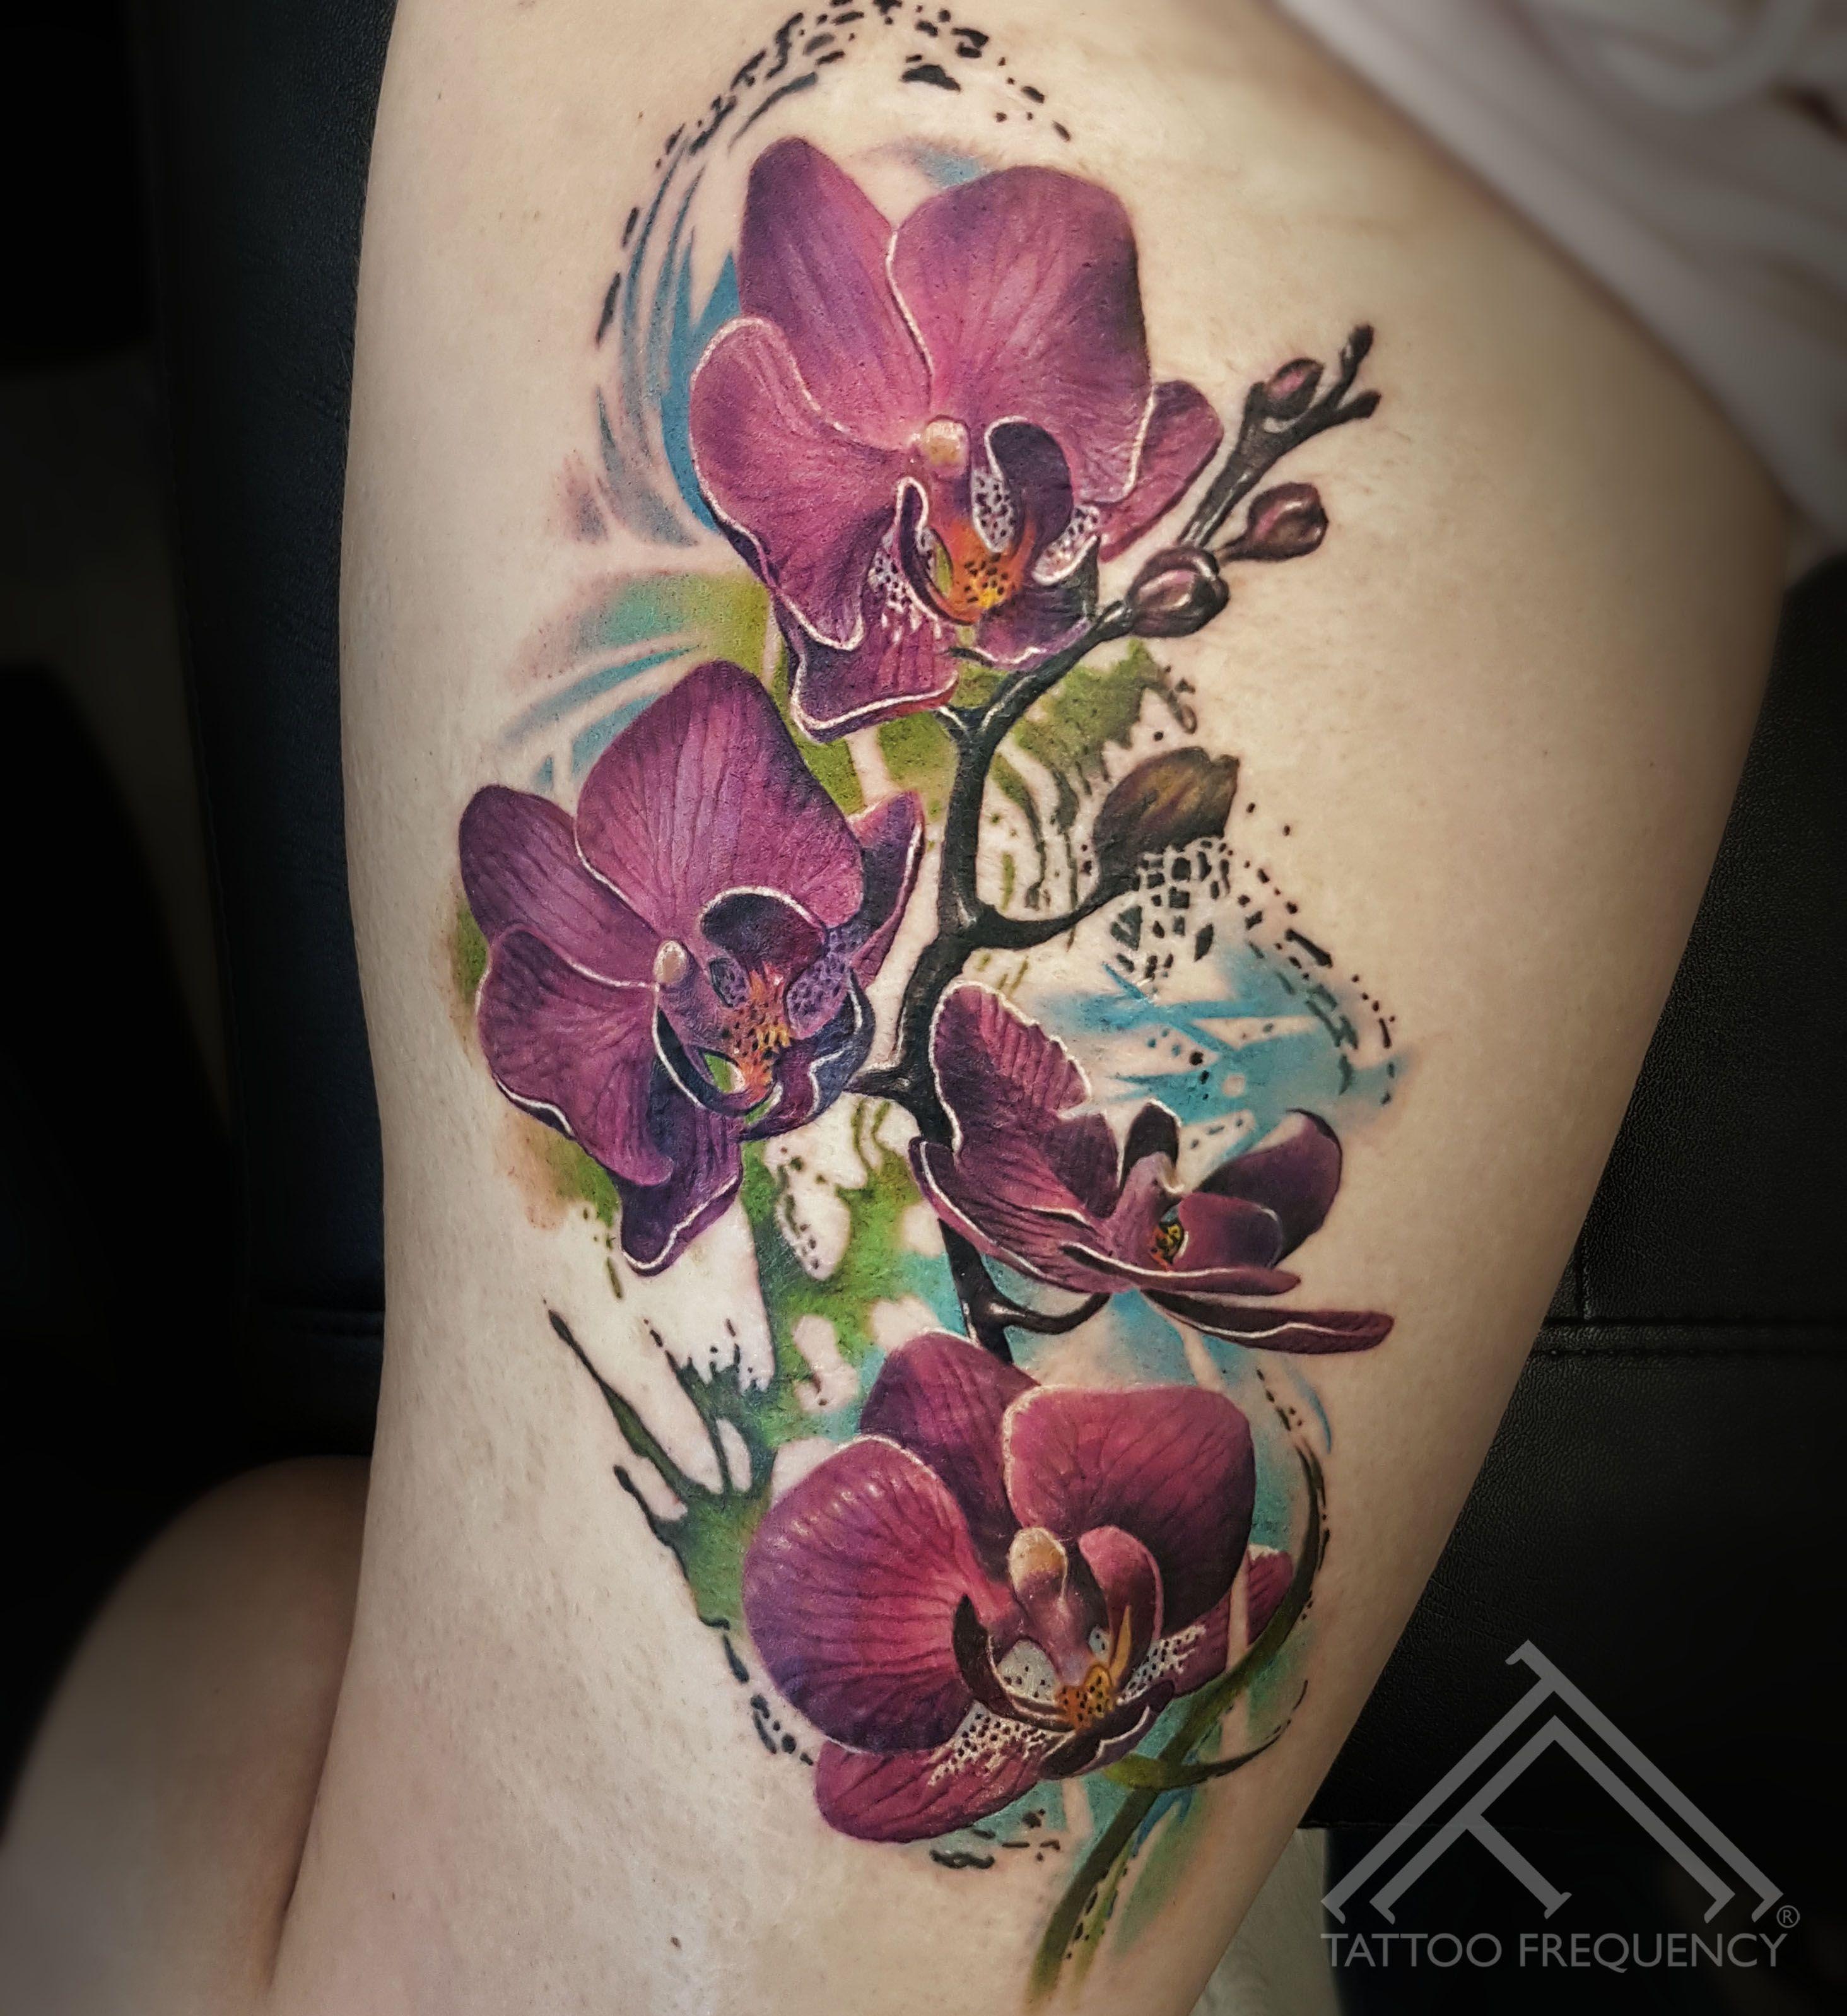 dc1a4d0bfaed4 #orchid #flower #orchidtattoo #phalaenopsis #nature #realistic #realism  #colortattoo #legtattoo #feminine #womantattoo #riga #tattooinriga #sporta2  ...